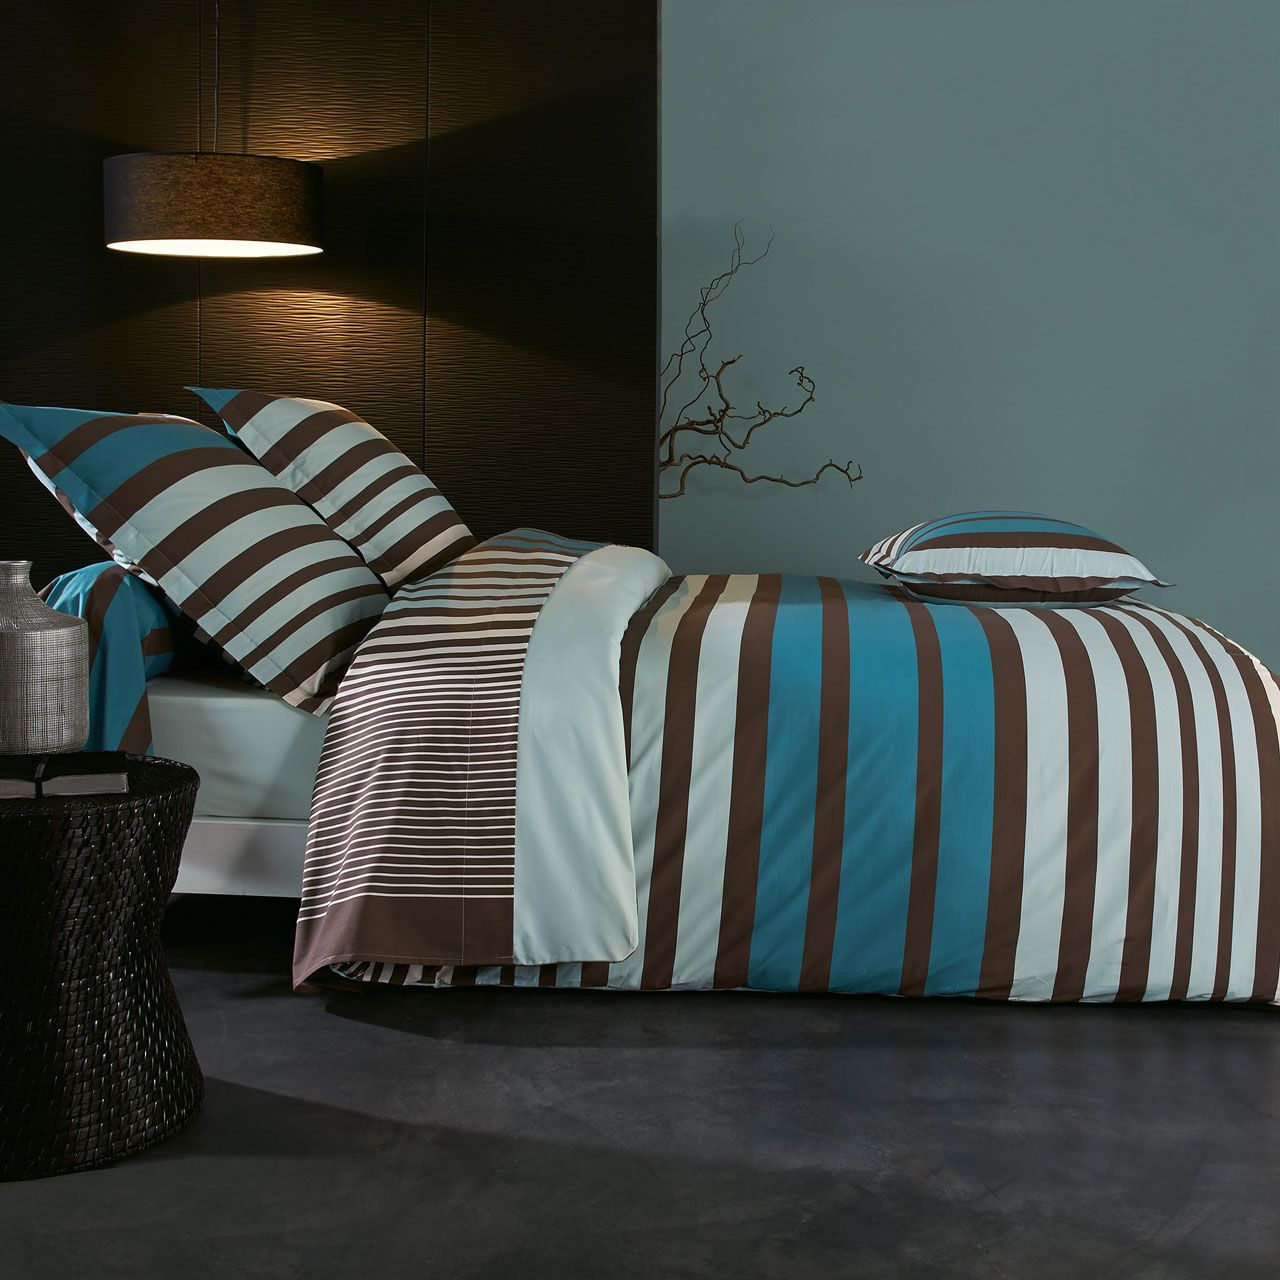 housse de couette percale stripe bleu 200x200 tradilinge. Black Bedroom Furniture Sets. Home Design Ideas